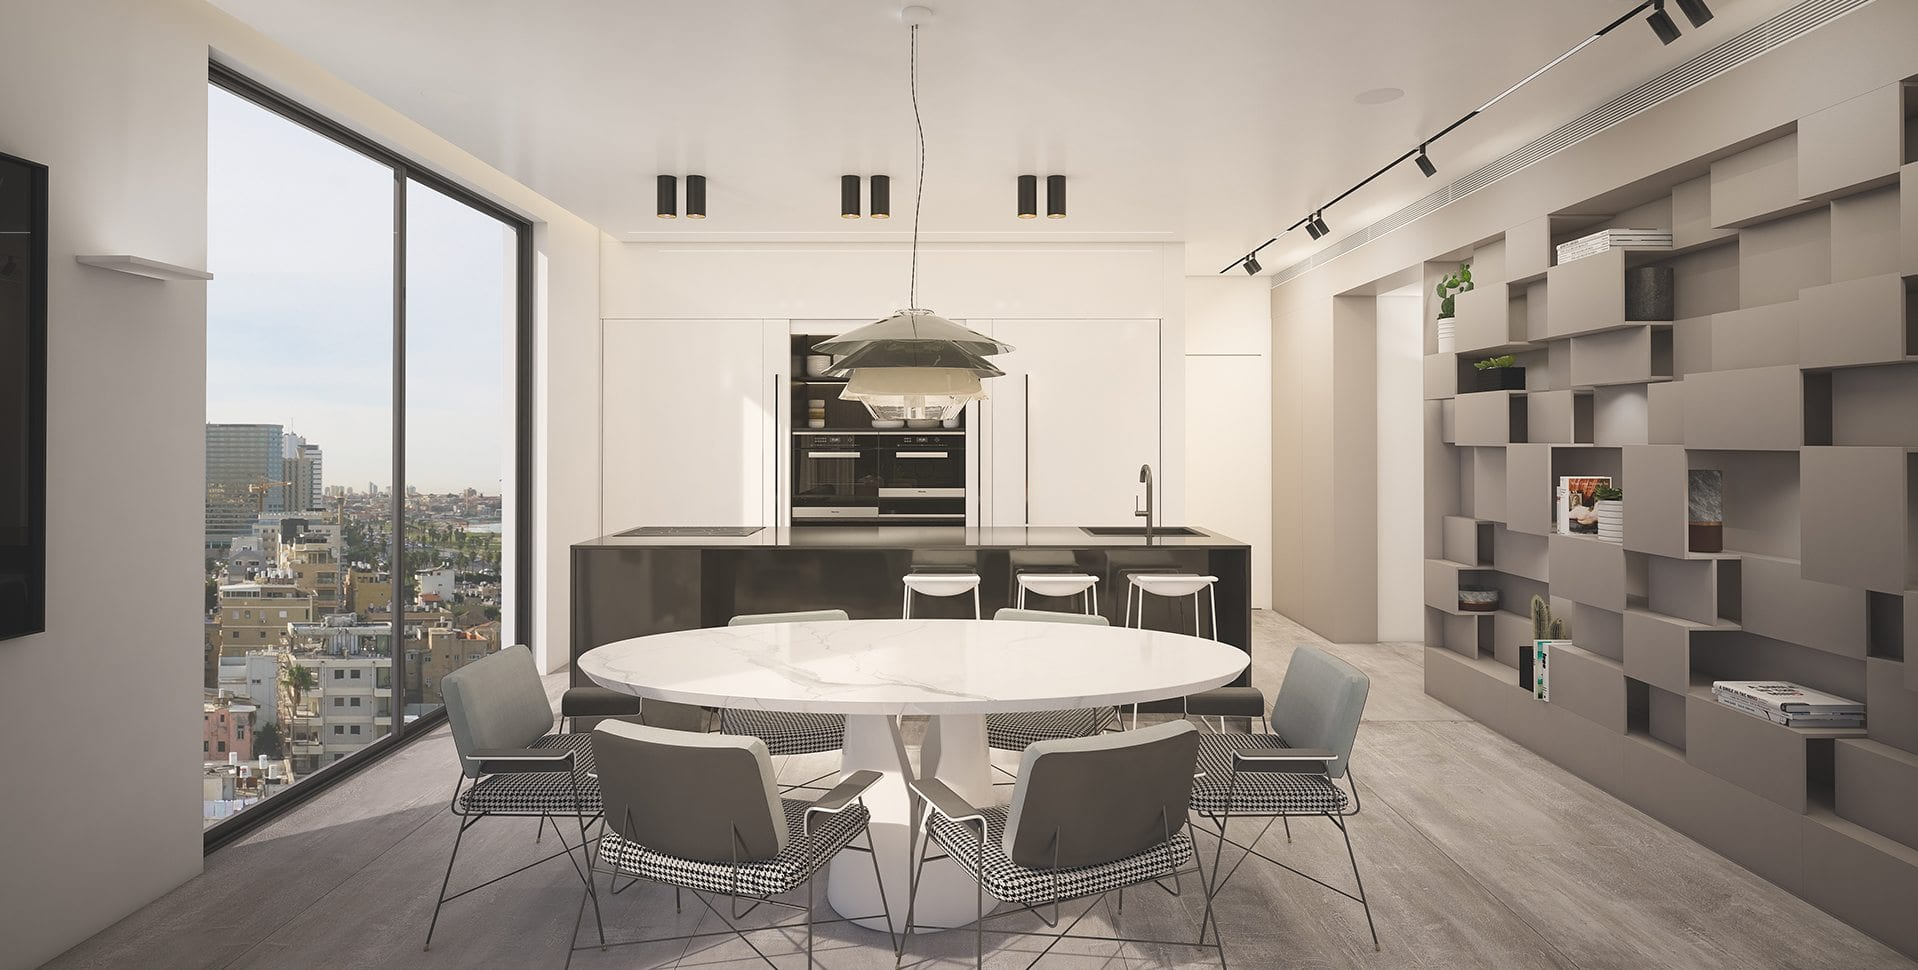 Maayan-Golan_Architectural-Visualization_ kitchen-interior-visualization_nehemia-project_ws-interior-design_04